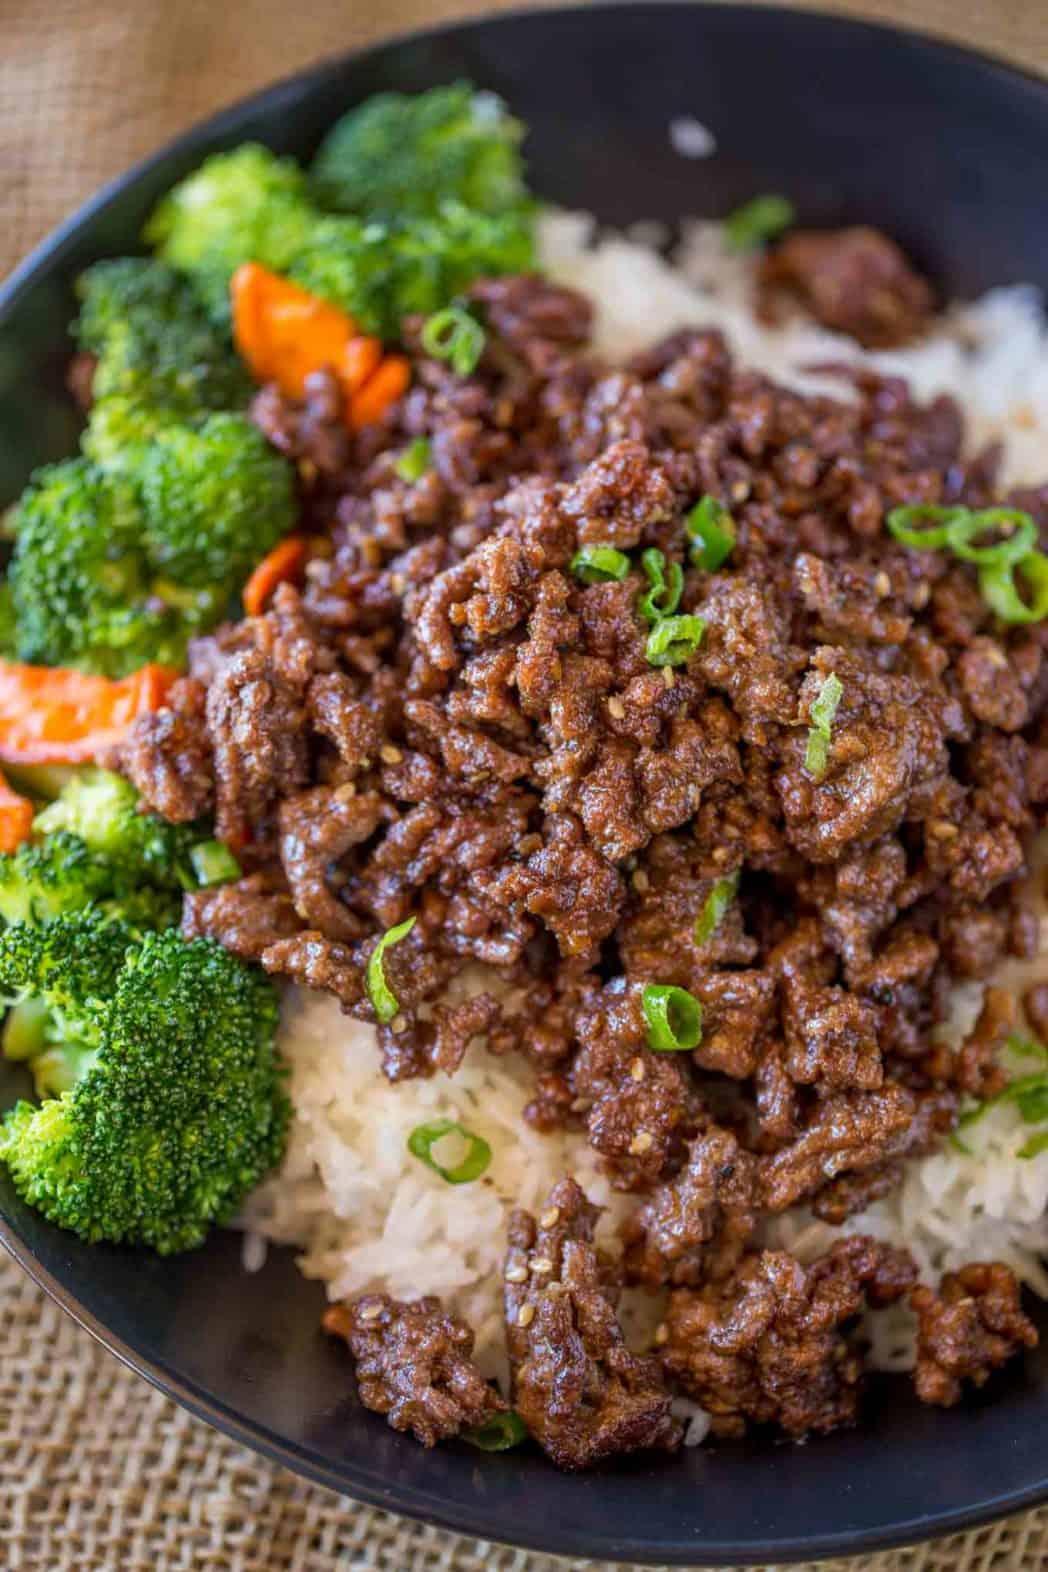 beef ground mongolian recipes recipe dinner meat easy rice food broccoli diyjoy mexican crispy dessert hamburger meals dinners dinnerthendessert carrots